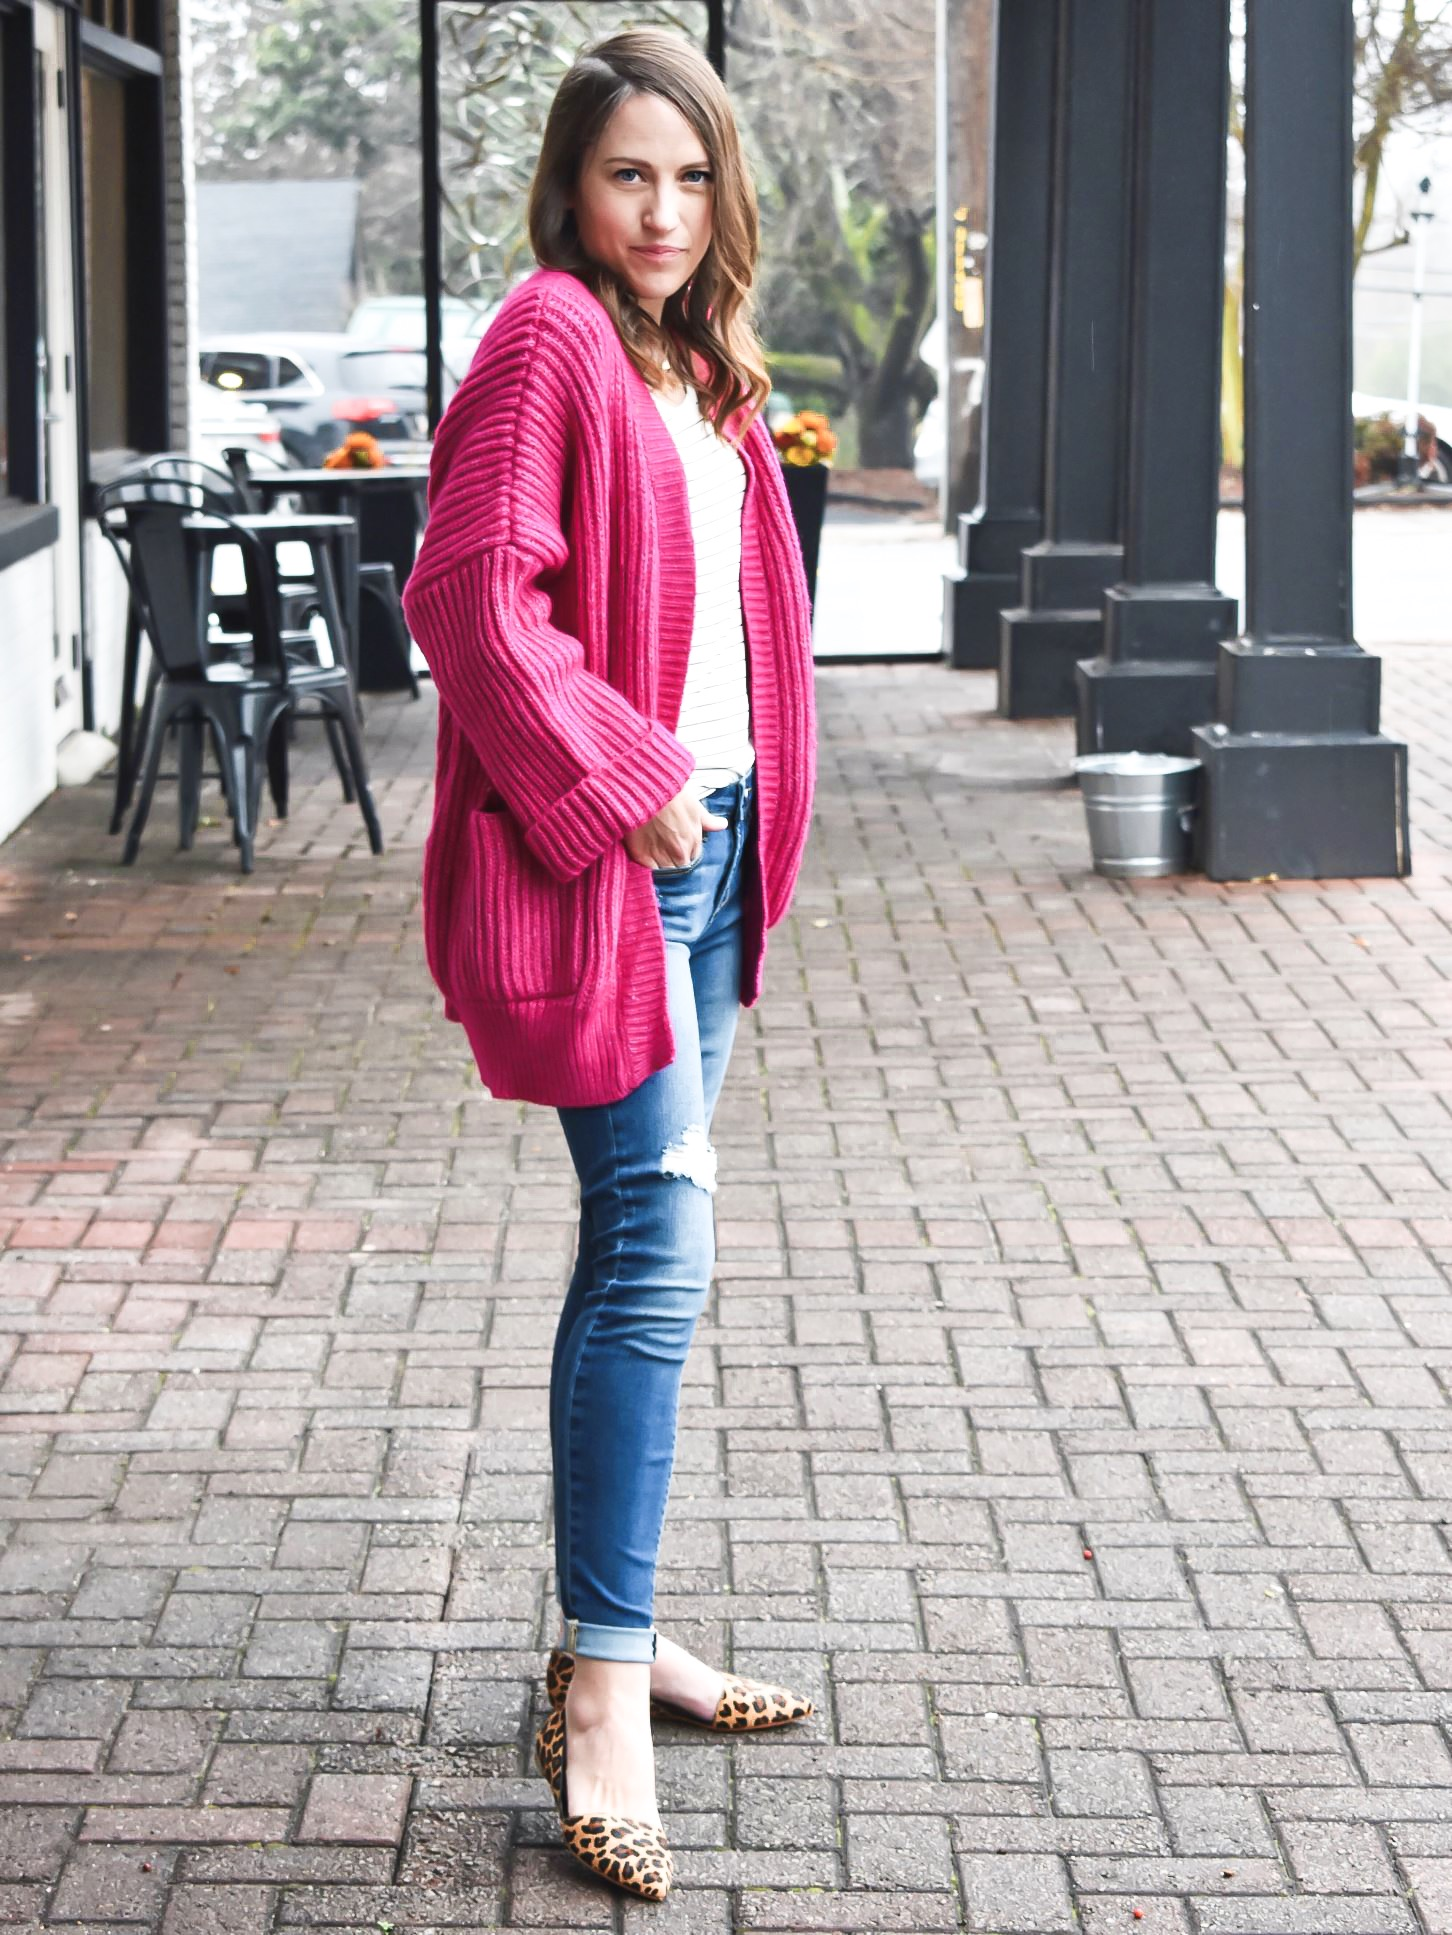 Pop of Color: Hot Pink Cardigan